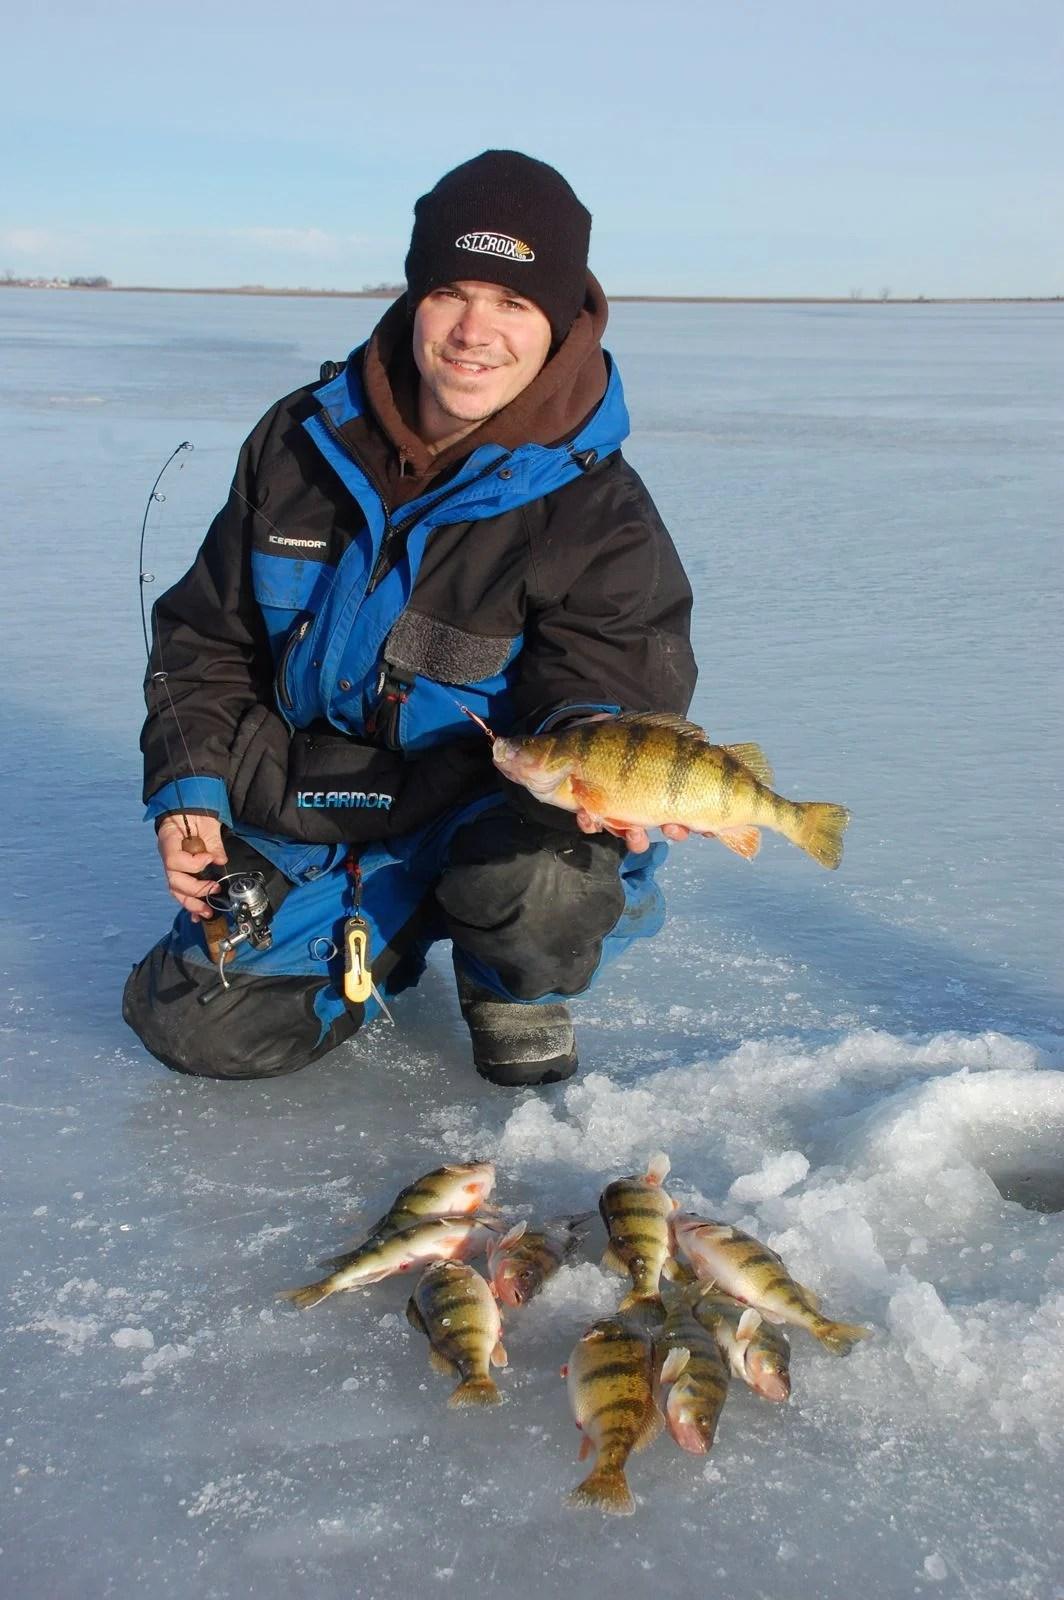 Farm Pond Ice Fishing